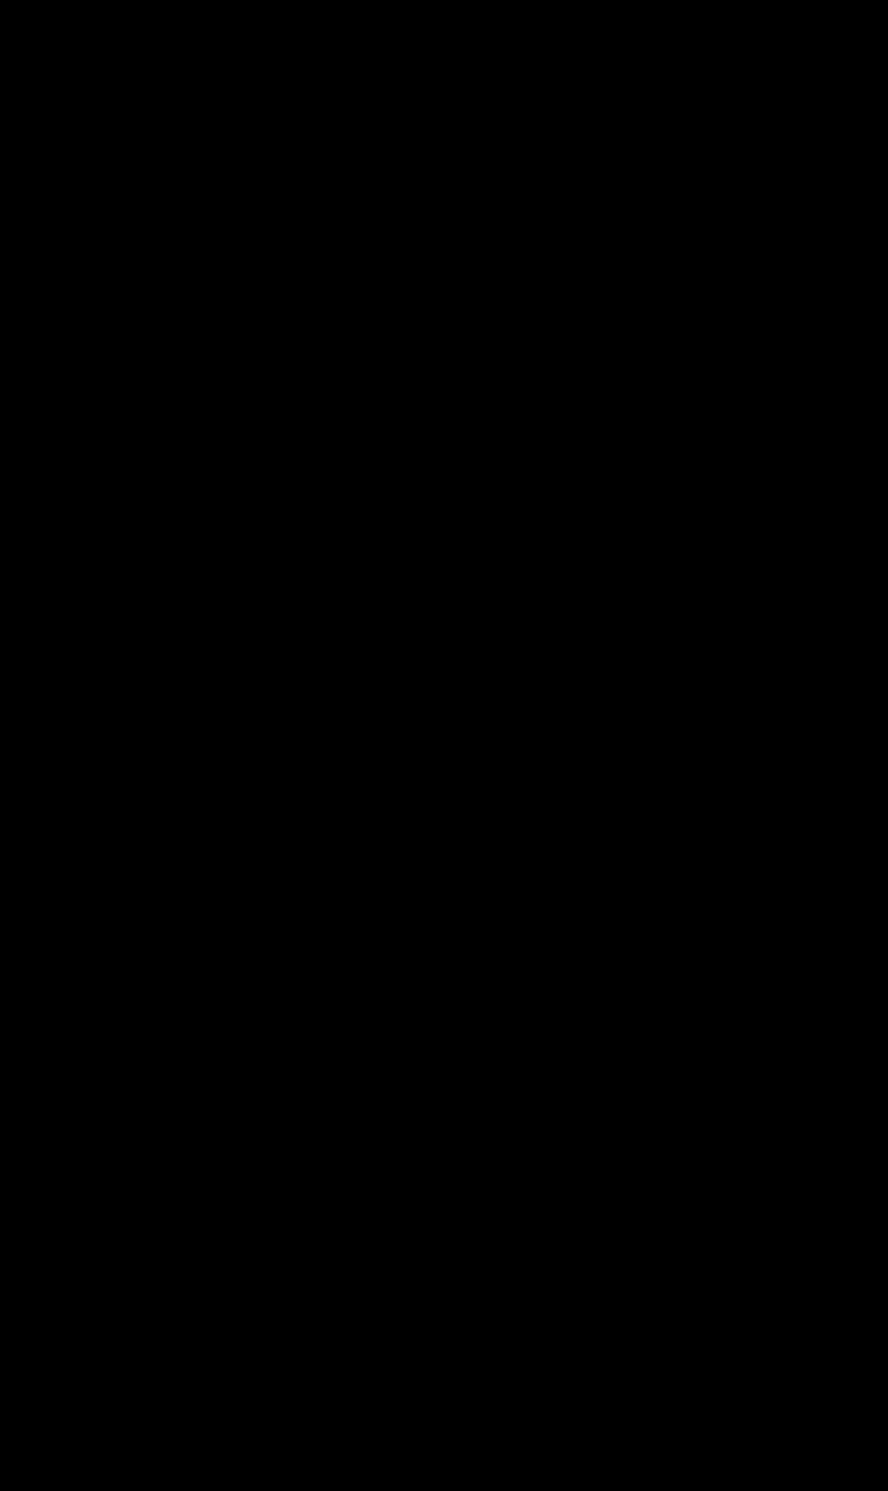 Medicom RAH Star Wars Jango Fett 1:6 Scale Figure